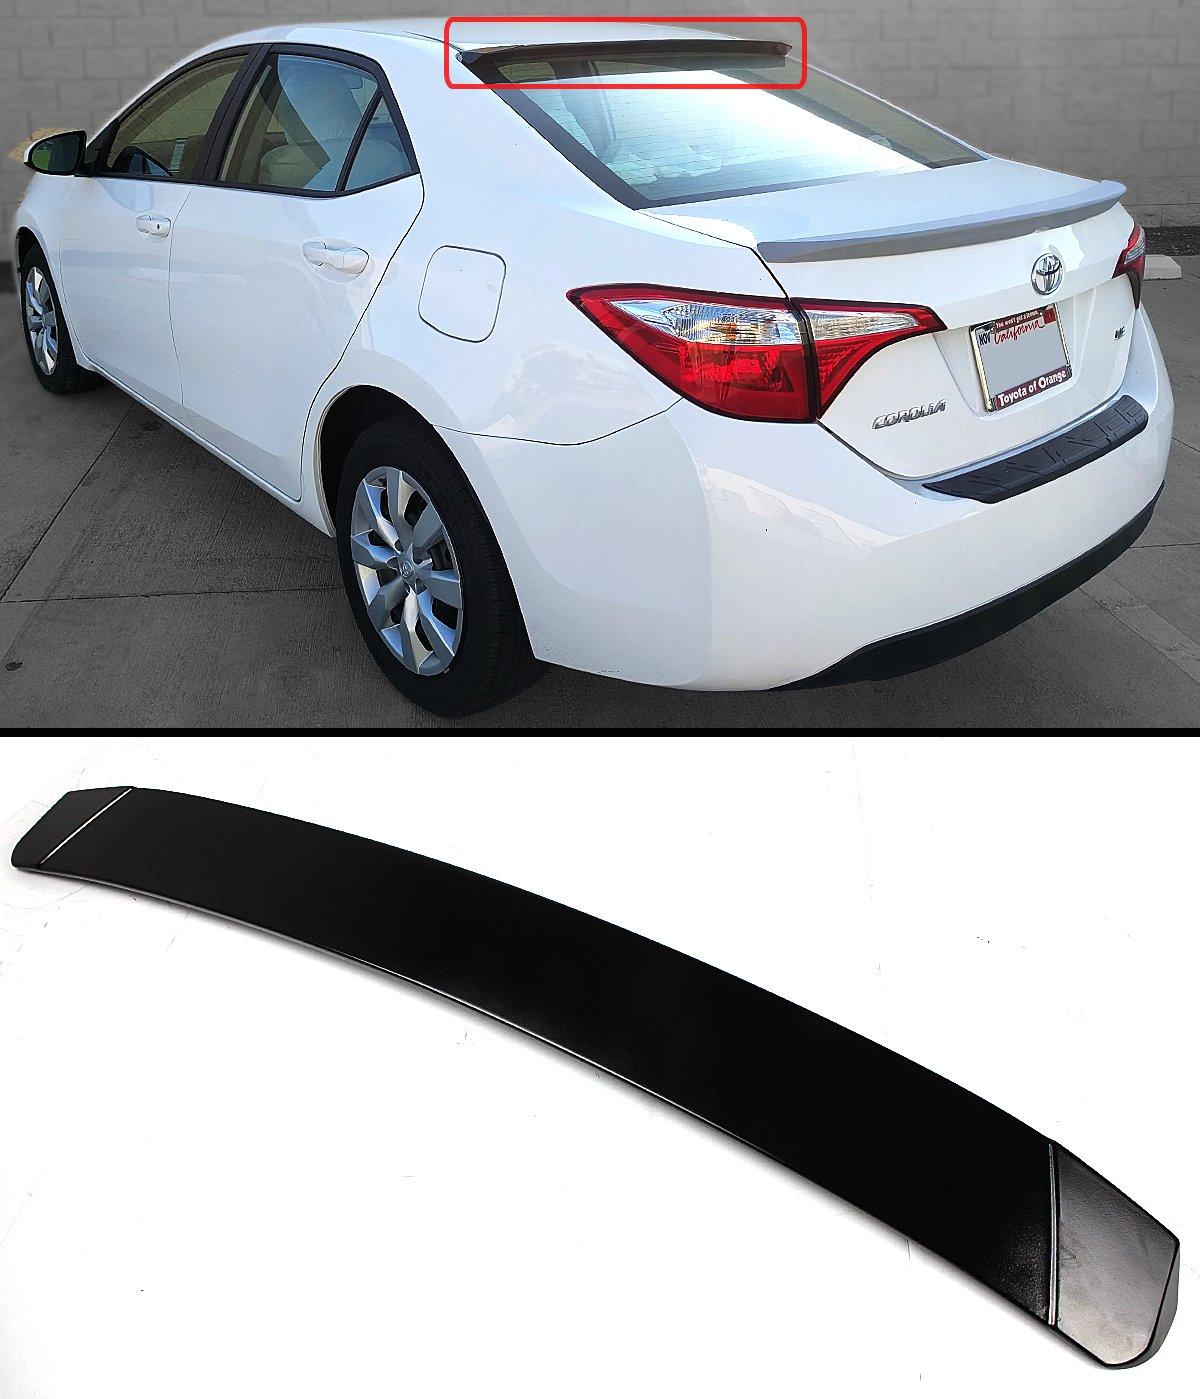 2009-2010 Toyota Corolla ABS Rear Roof Window Visor Spoiler Wide Type